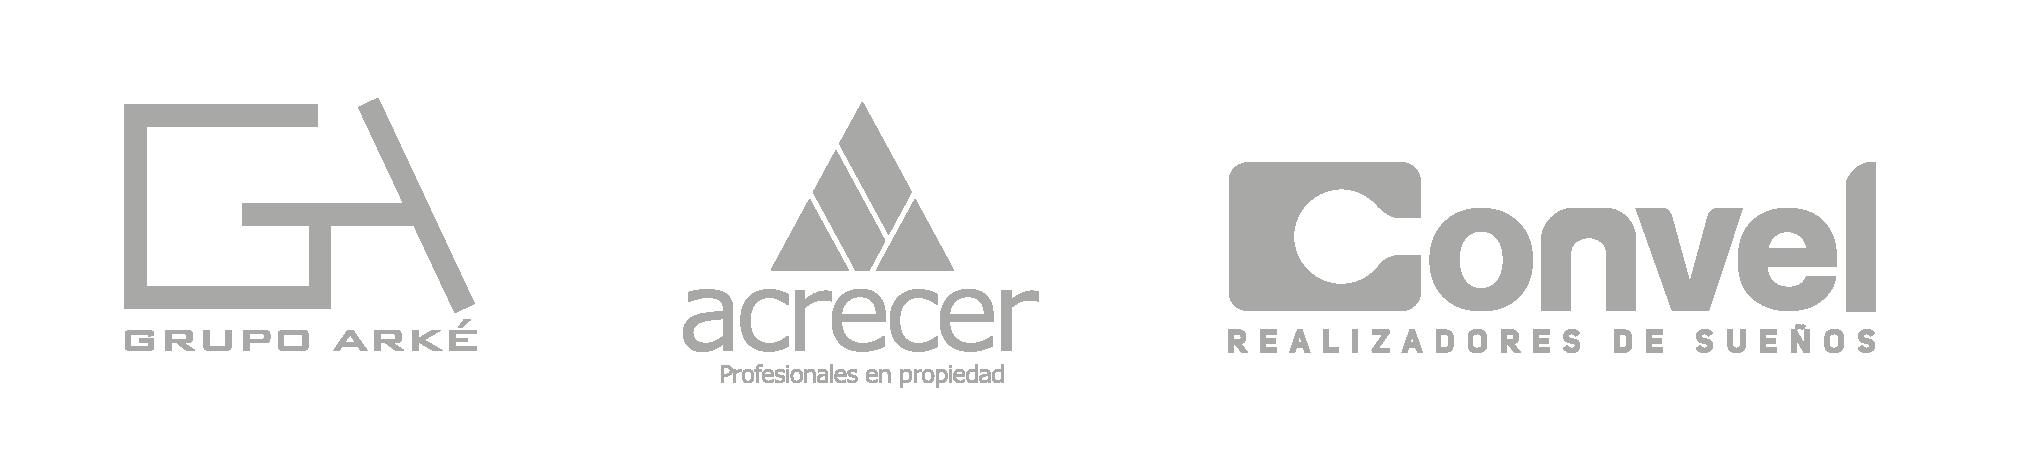 Logos GP-01